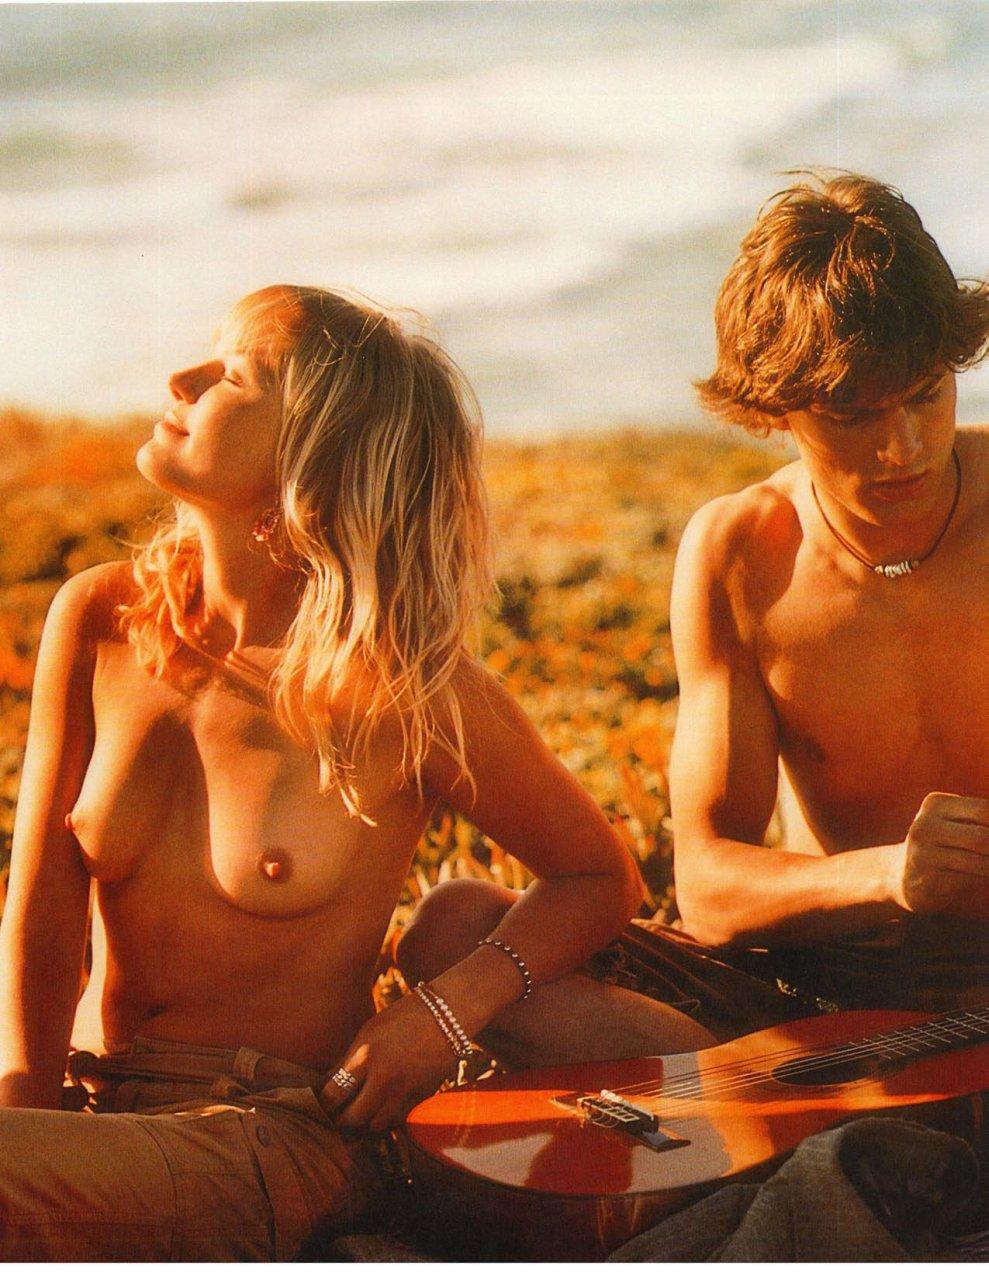 malin akerman nude pics